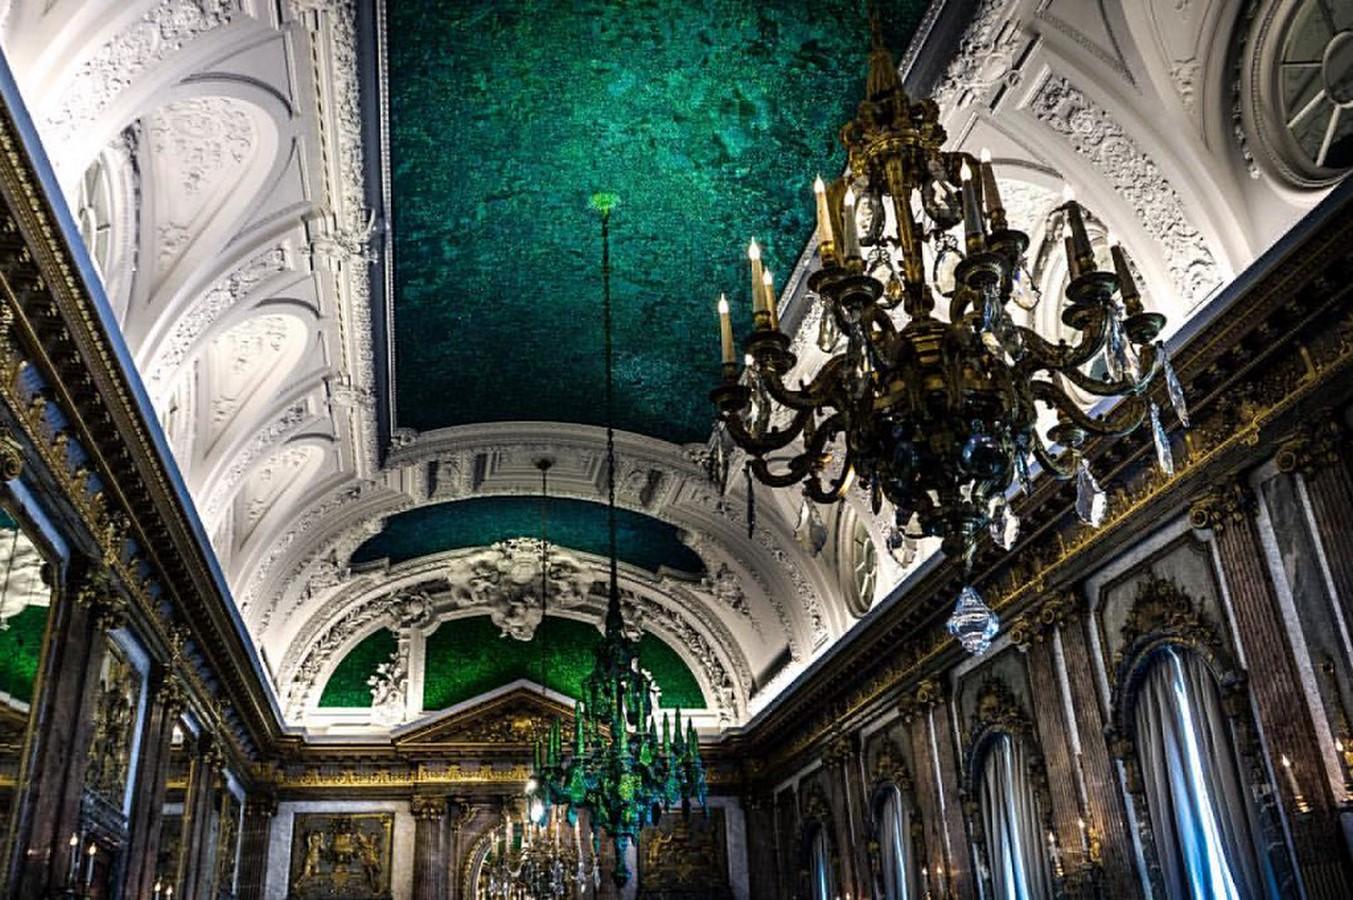 Royal Palace of Brussels by Architect Alphonse Balat: A resplendent vision of Grandeur - Sheet9